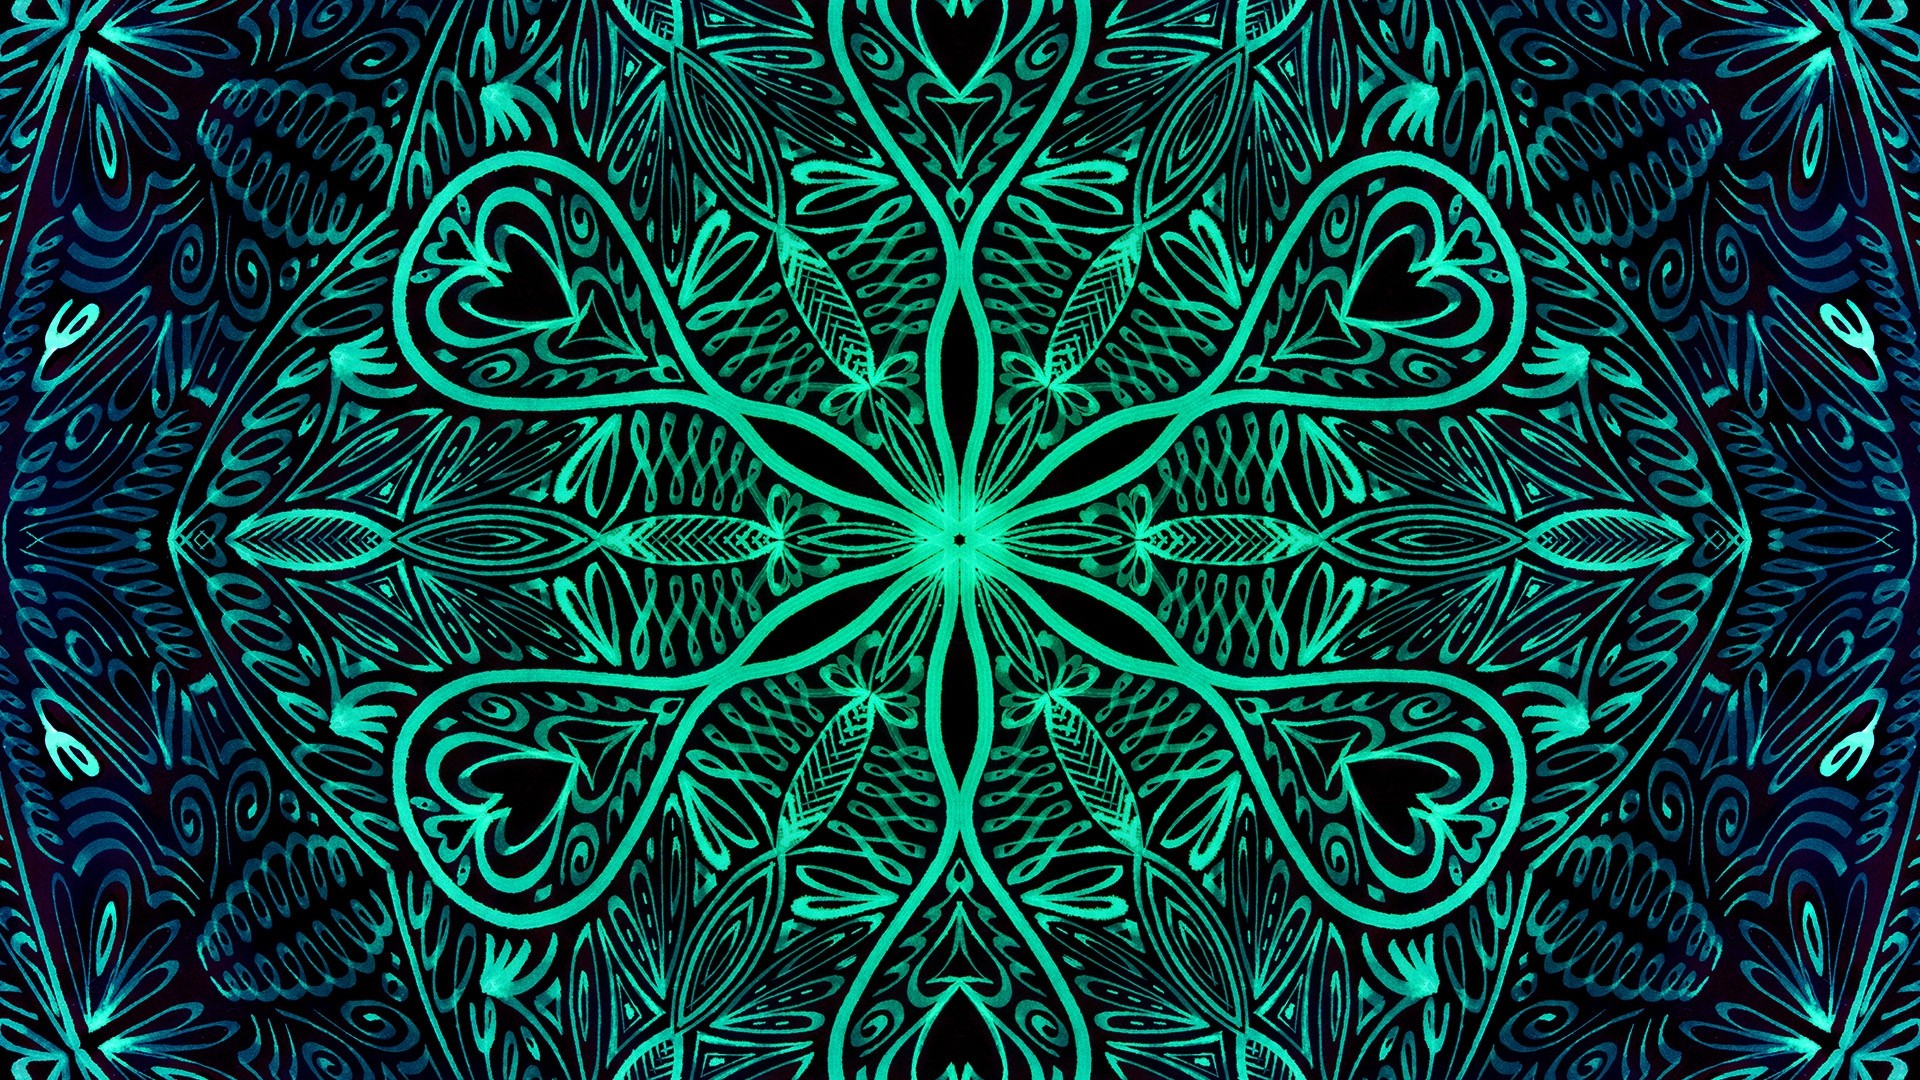 Mandala Wallpaper theme